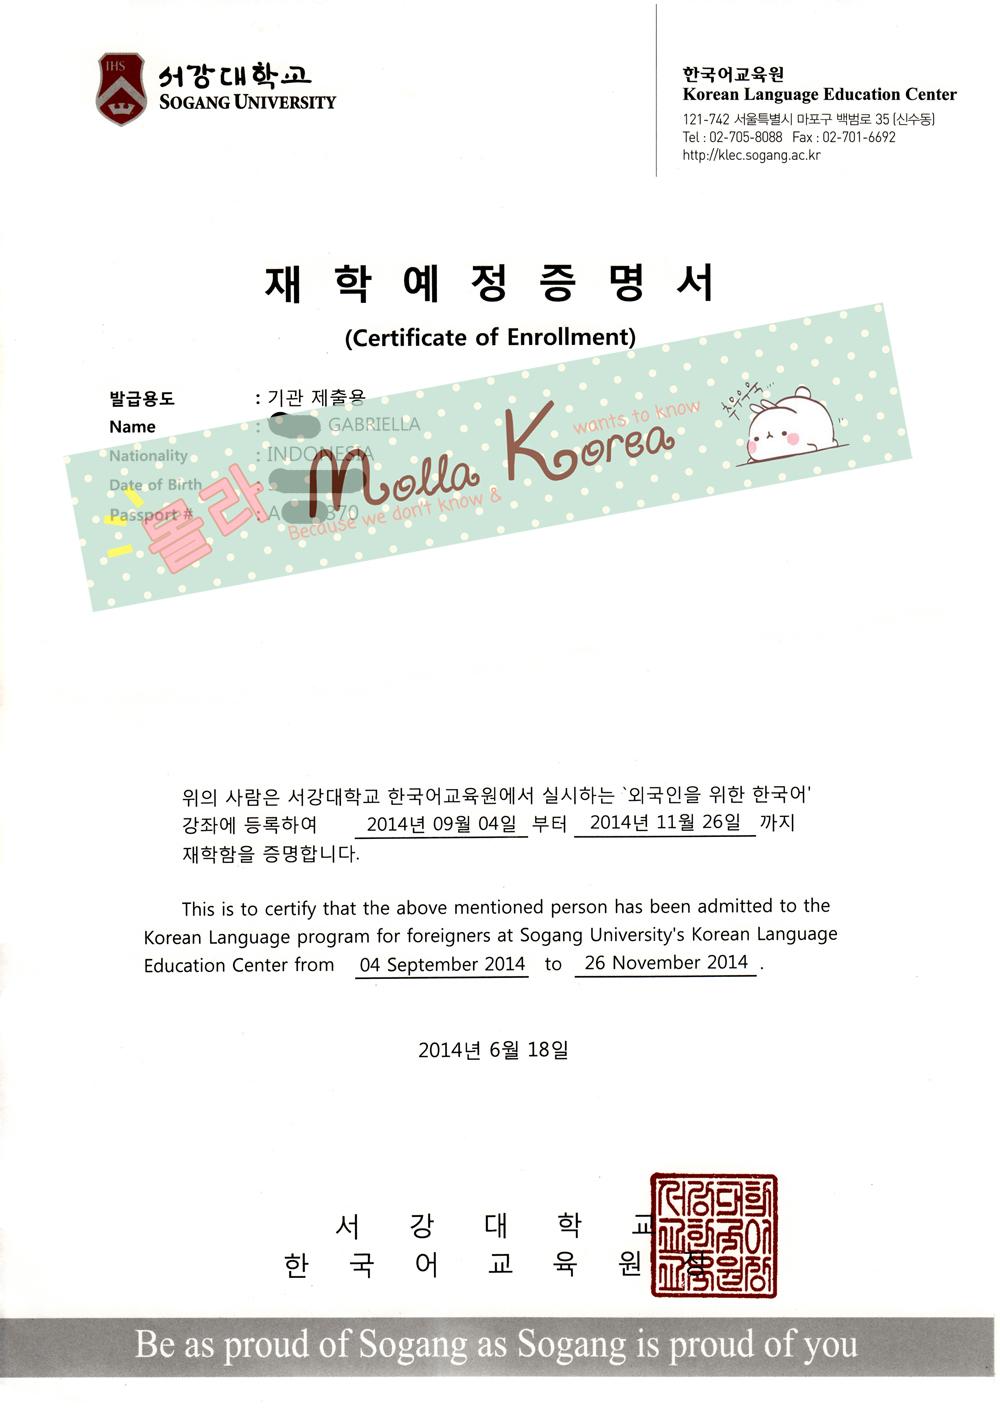 Sogang University KLEC Certificate of Enrollment_가비_molang korea